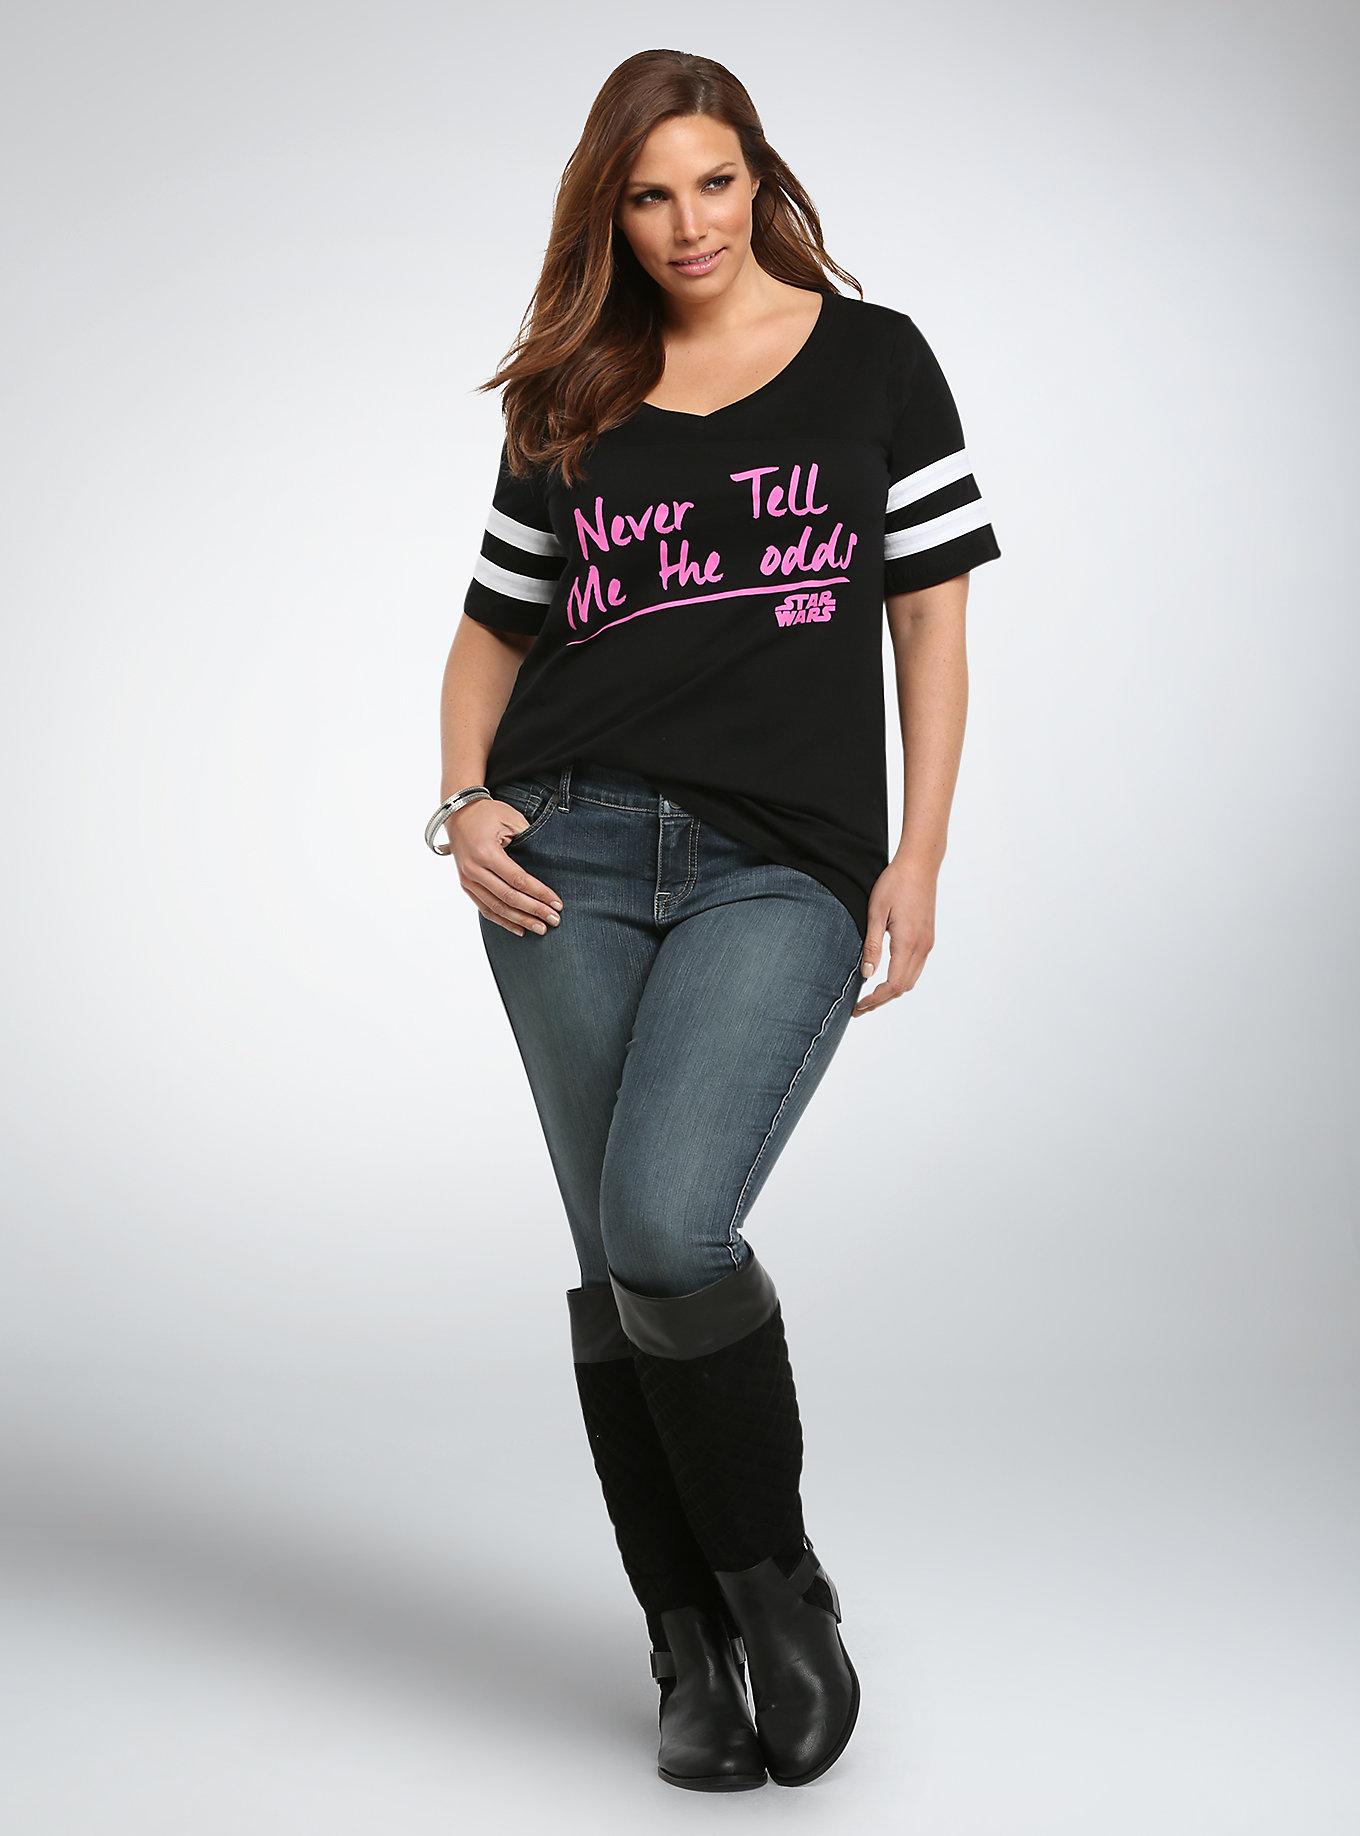 Kayla Swift Joins     Water s Neverending List of Models Fotolia com